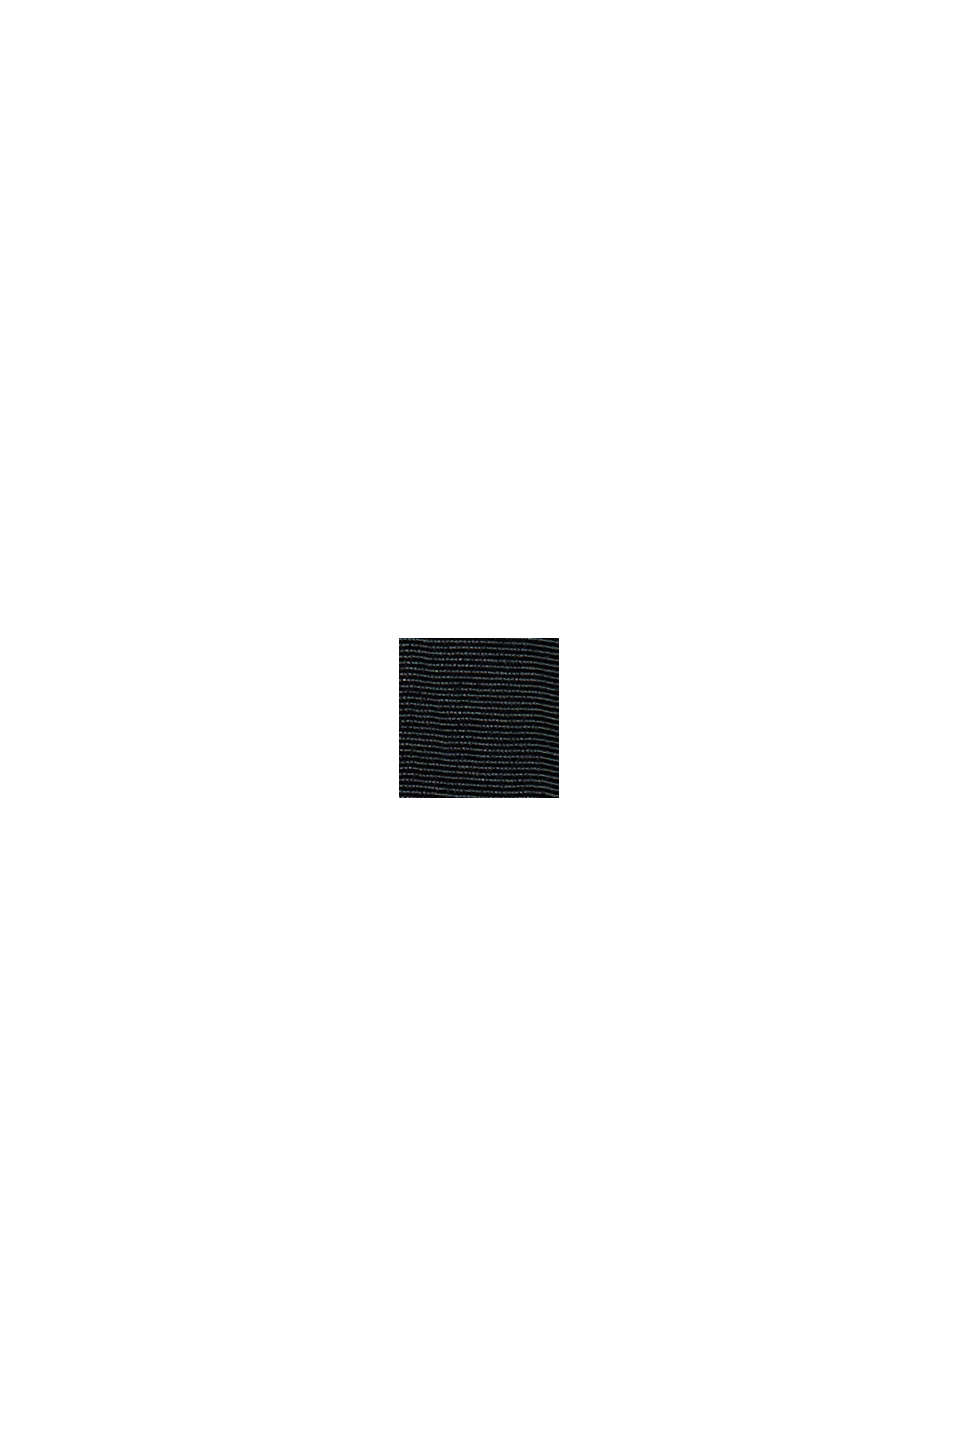 Giacca impermeabile per le mezze stagioni, BLACK, swatch